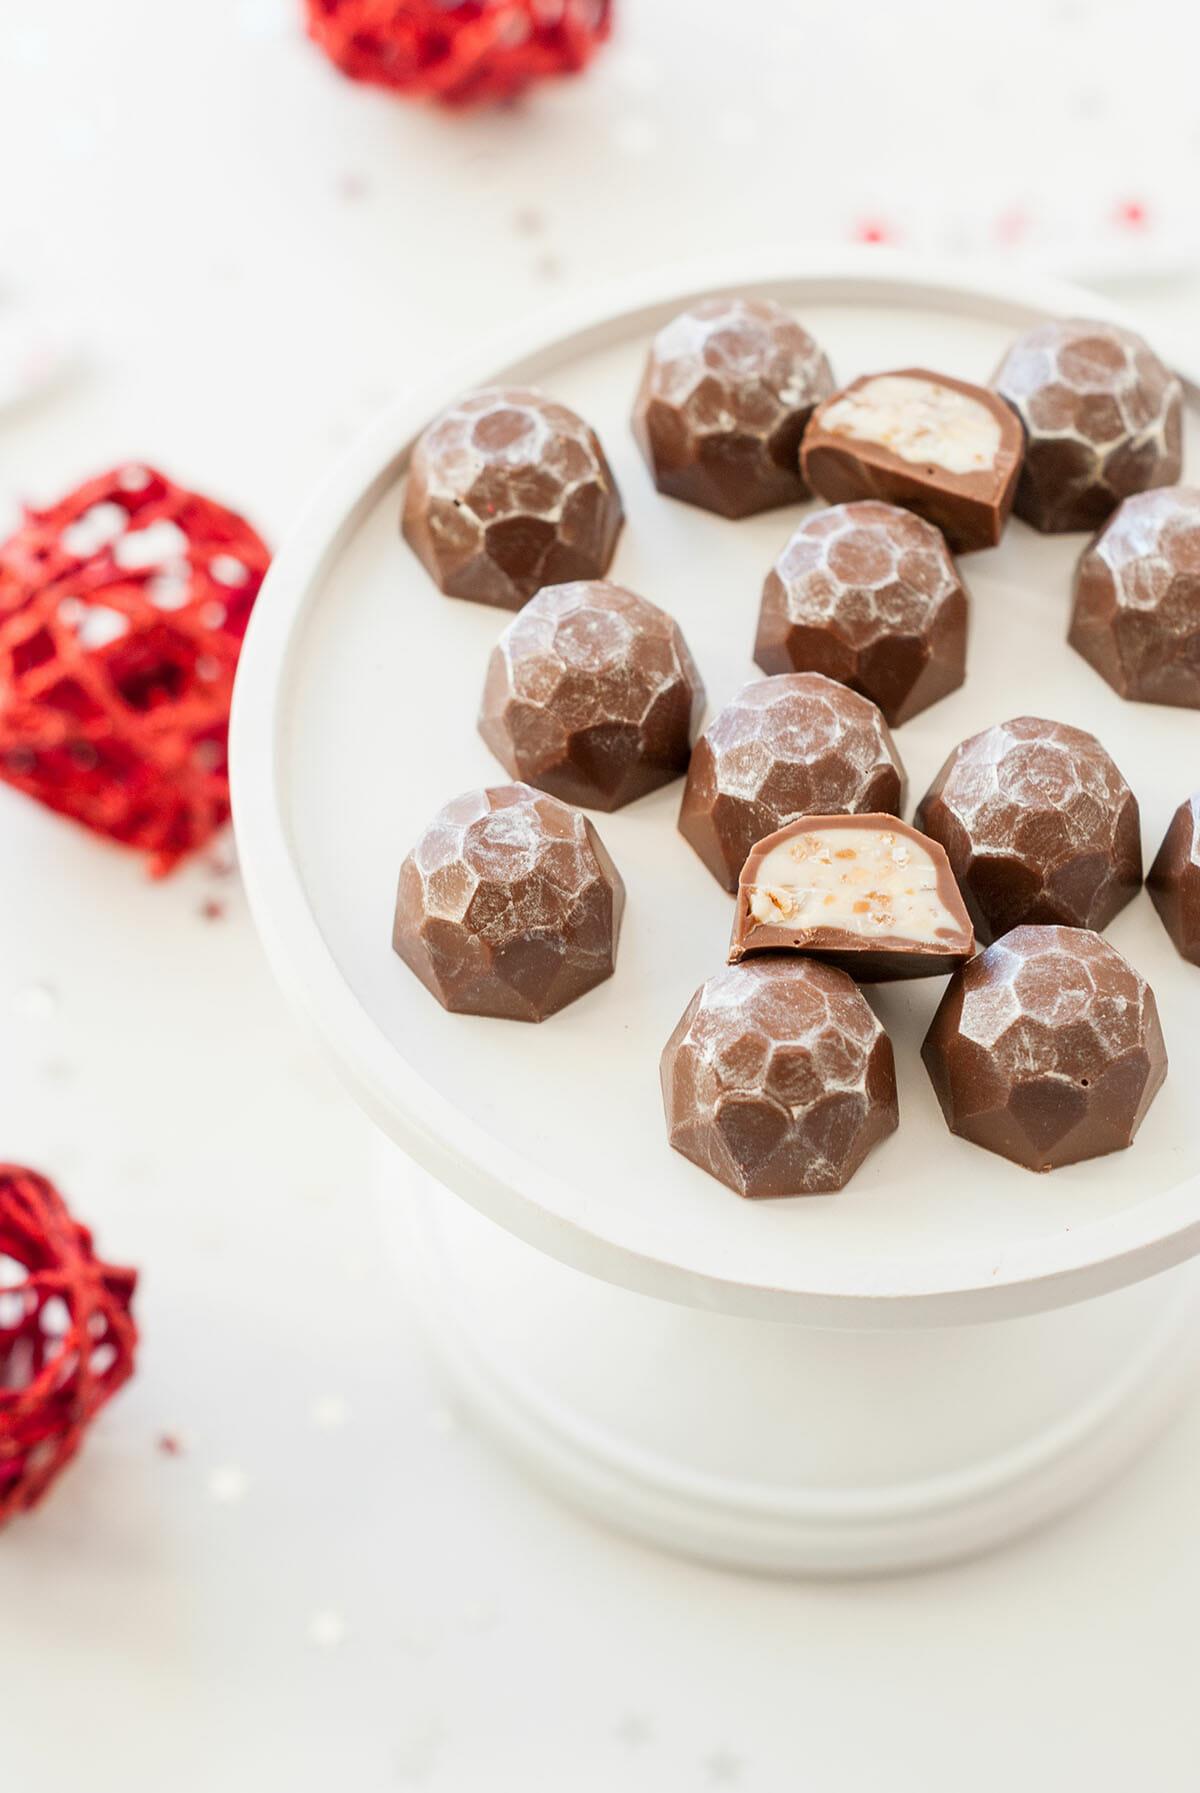 Lilie Bakery | Chocolats Façon Kinder® Schoko-bons { DIY Noël } 1